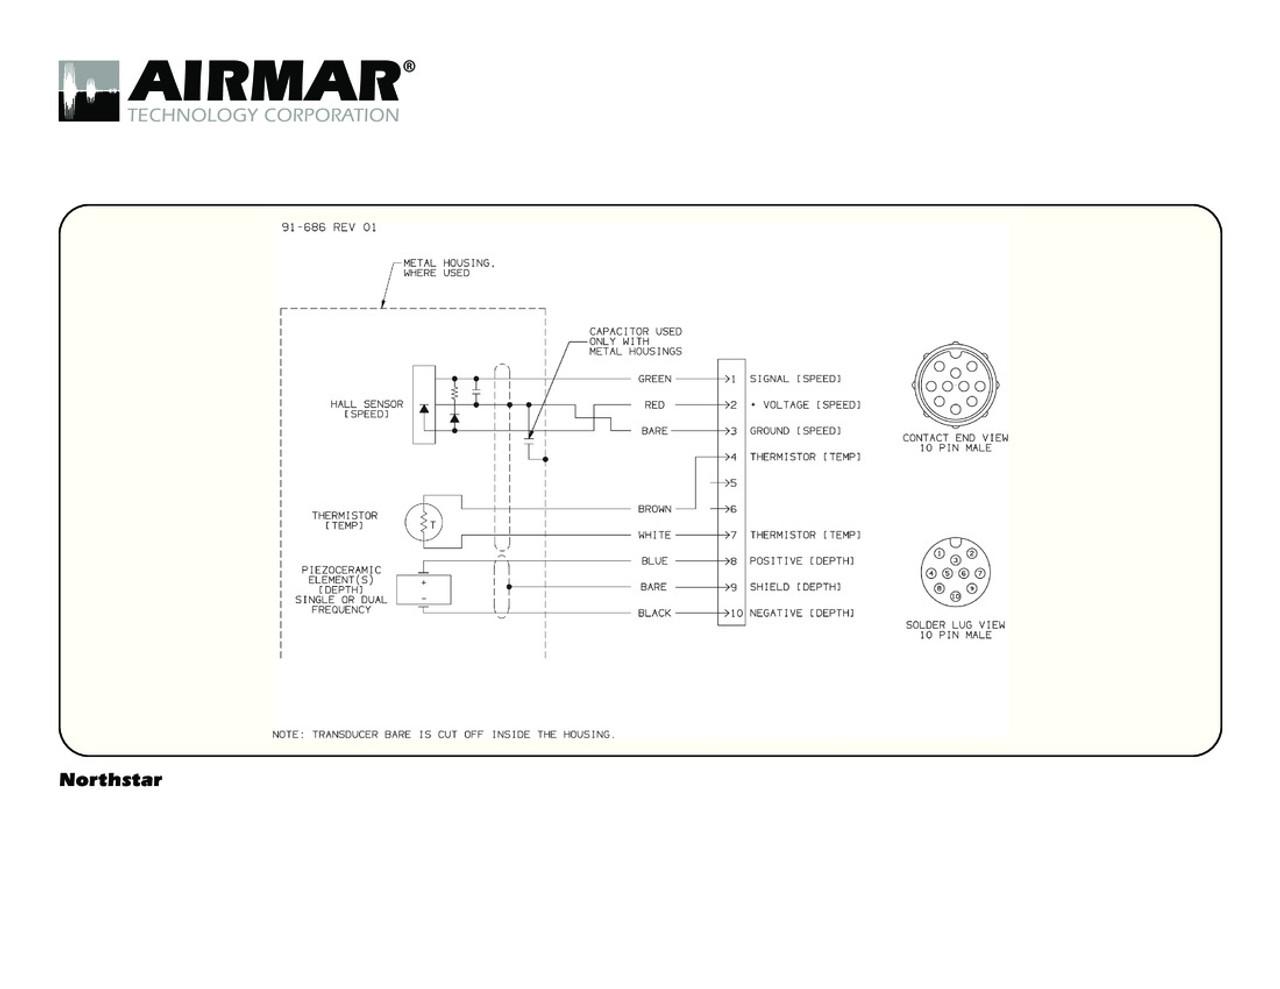 4B8BDE Furuno Radar Wiring Diagrams | Wiring Resources 4.6 northstar engine Wiring Resources